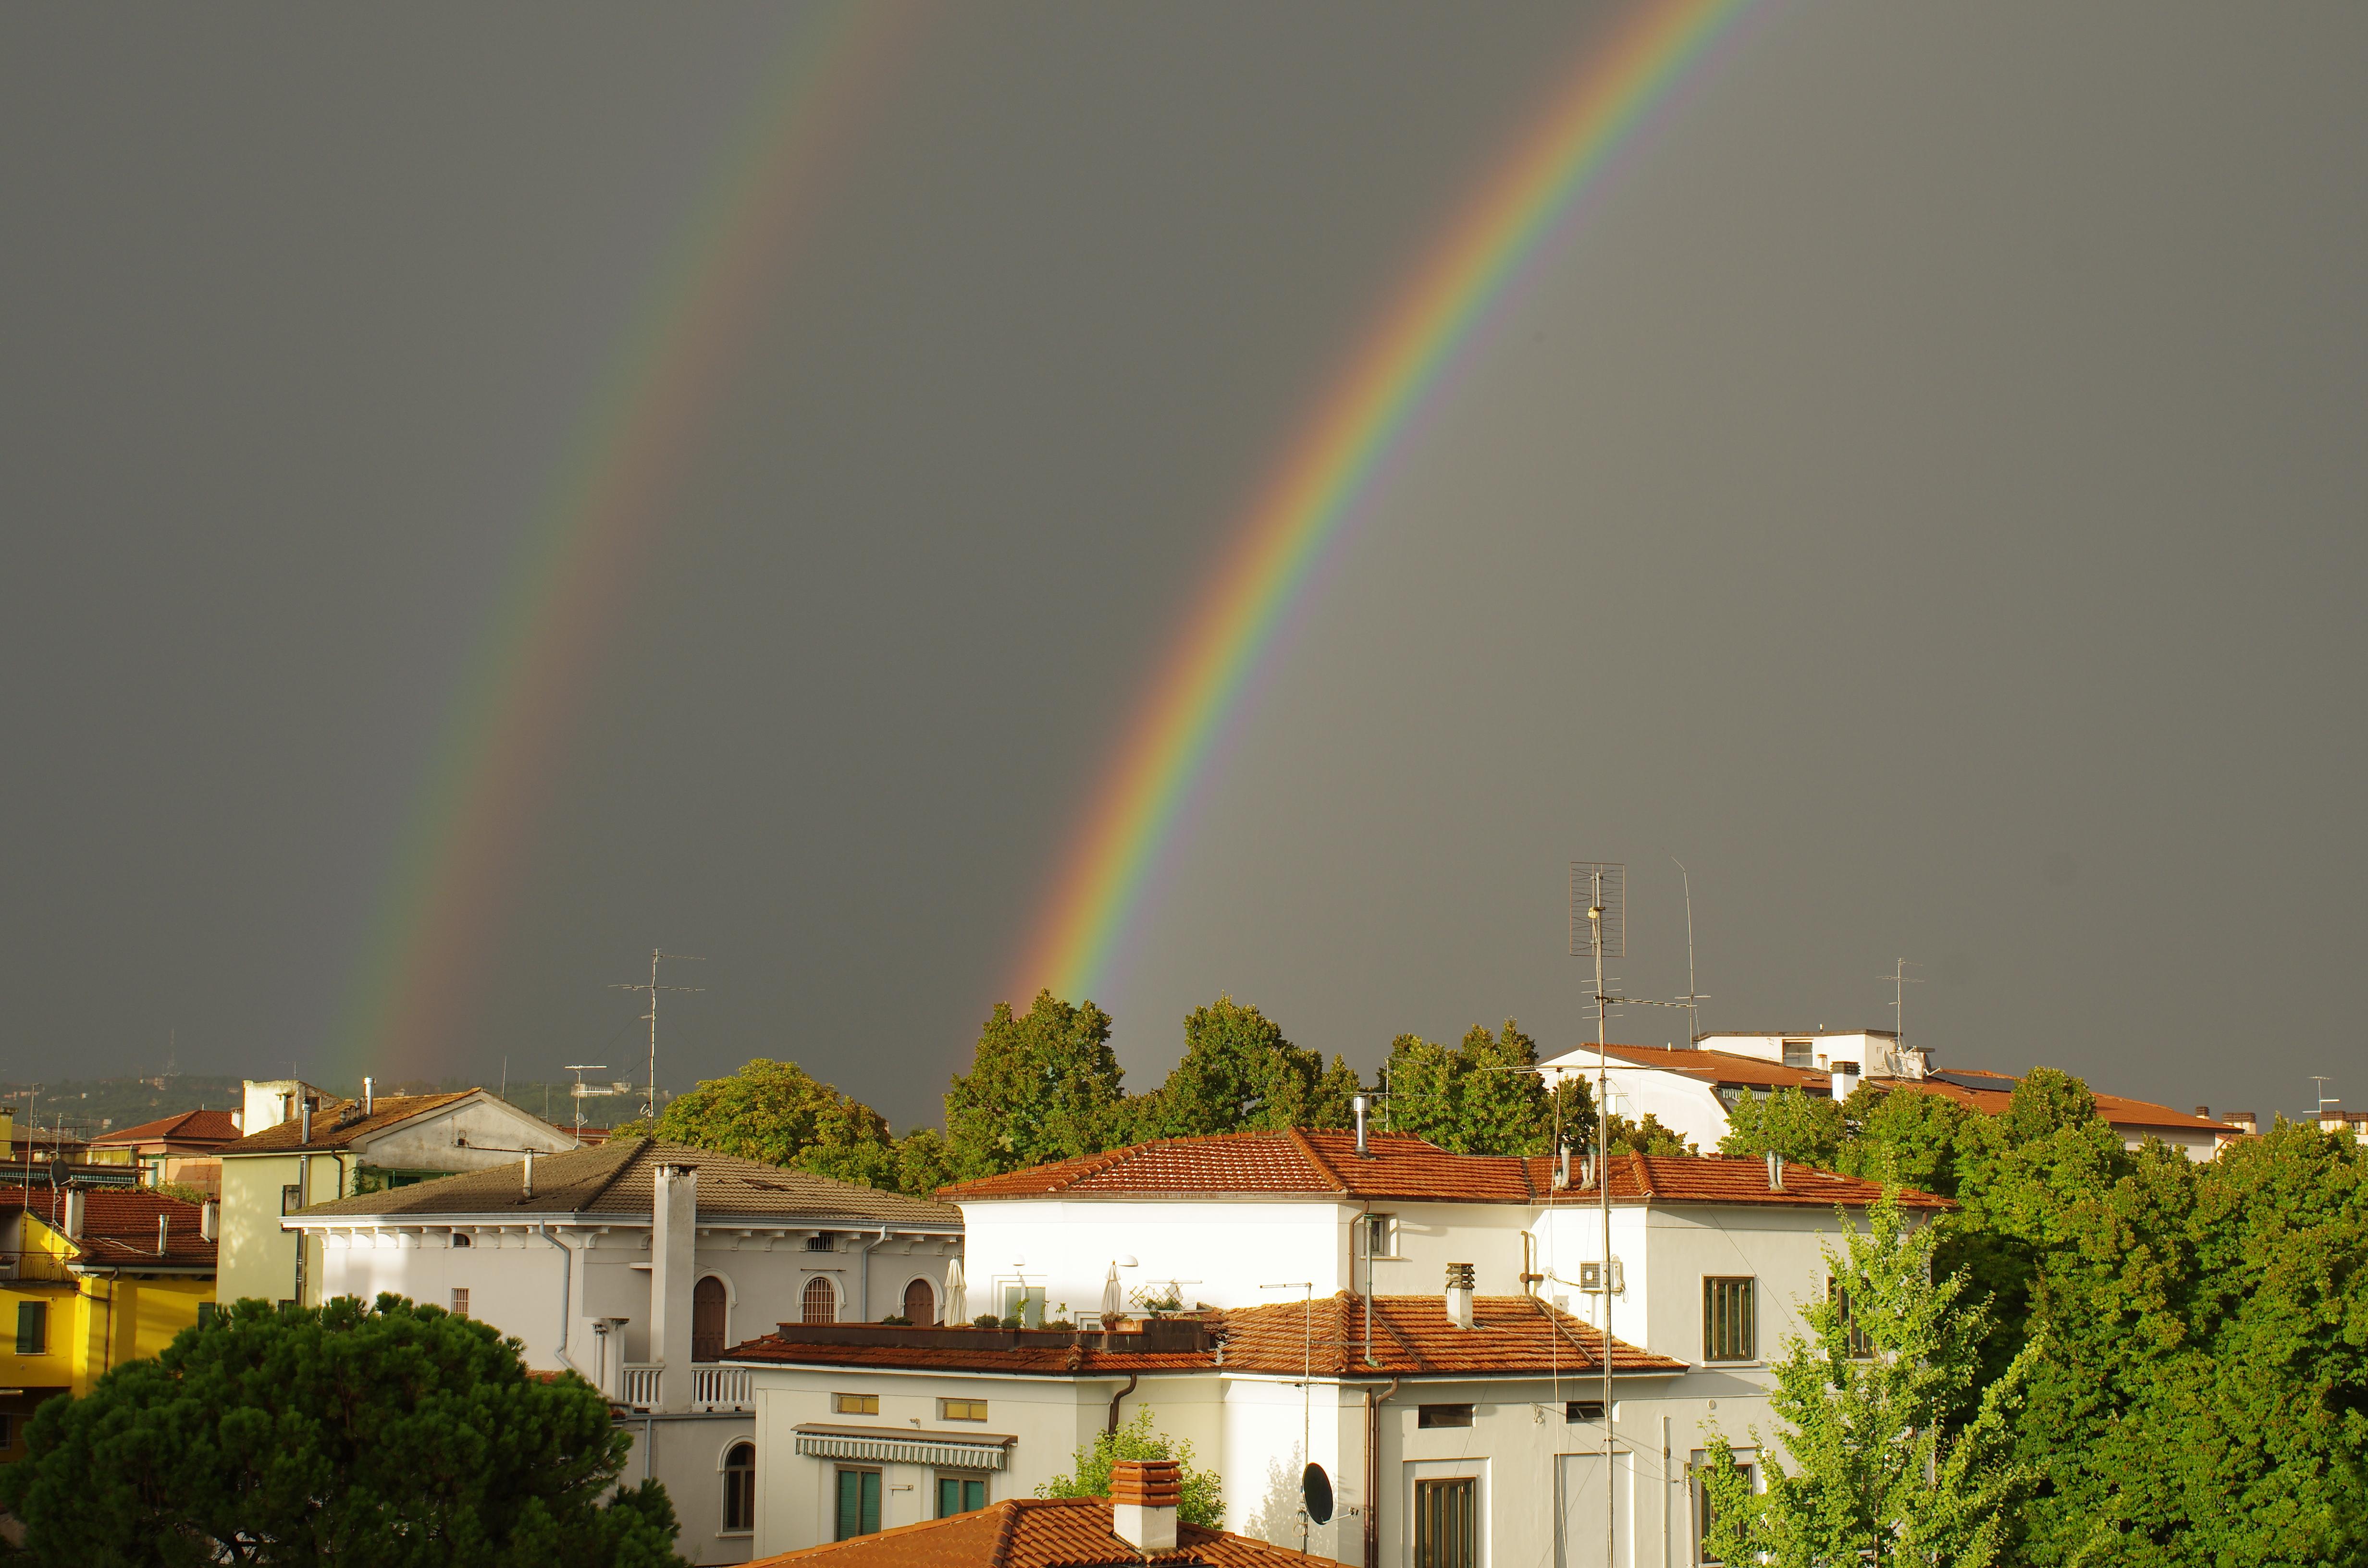 2018 09 photo Paolo Villa-Category-Verona rainbows-Arcobaleno doppio arco-PENTAX K-5 II-smc PENTAX-FA 35mm F2 AL-primary and secondary rainbow with Alexander's dark band-Category-Double rainbows in Italy-Category-Supernumerary rainbows-.jpg